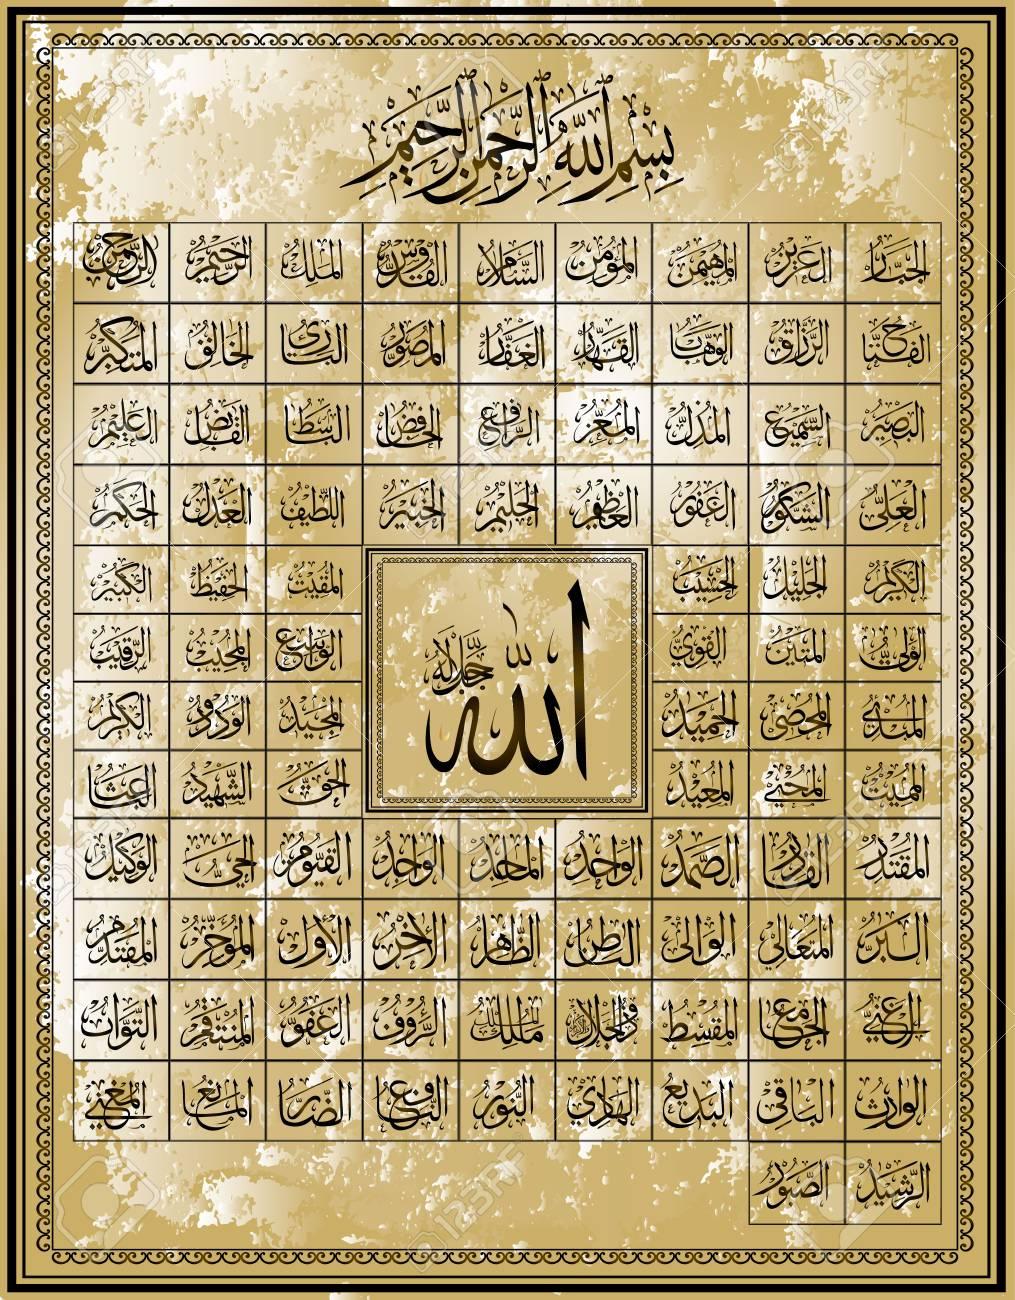 Islamic calligraphy 99 names of Allah. - 110774008